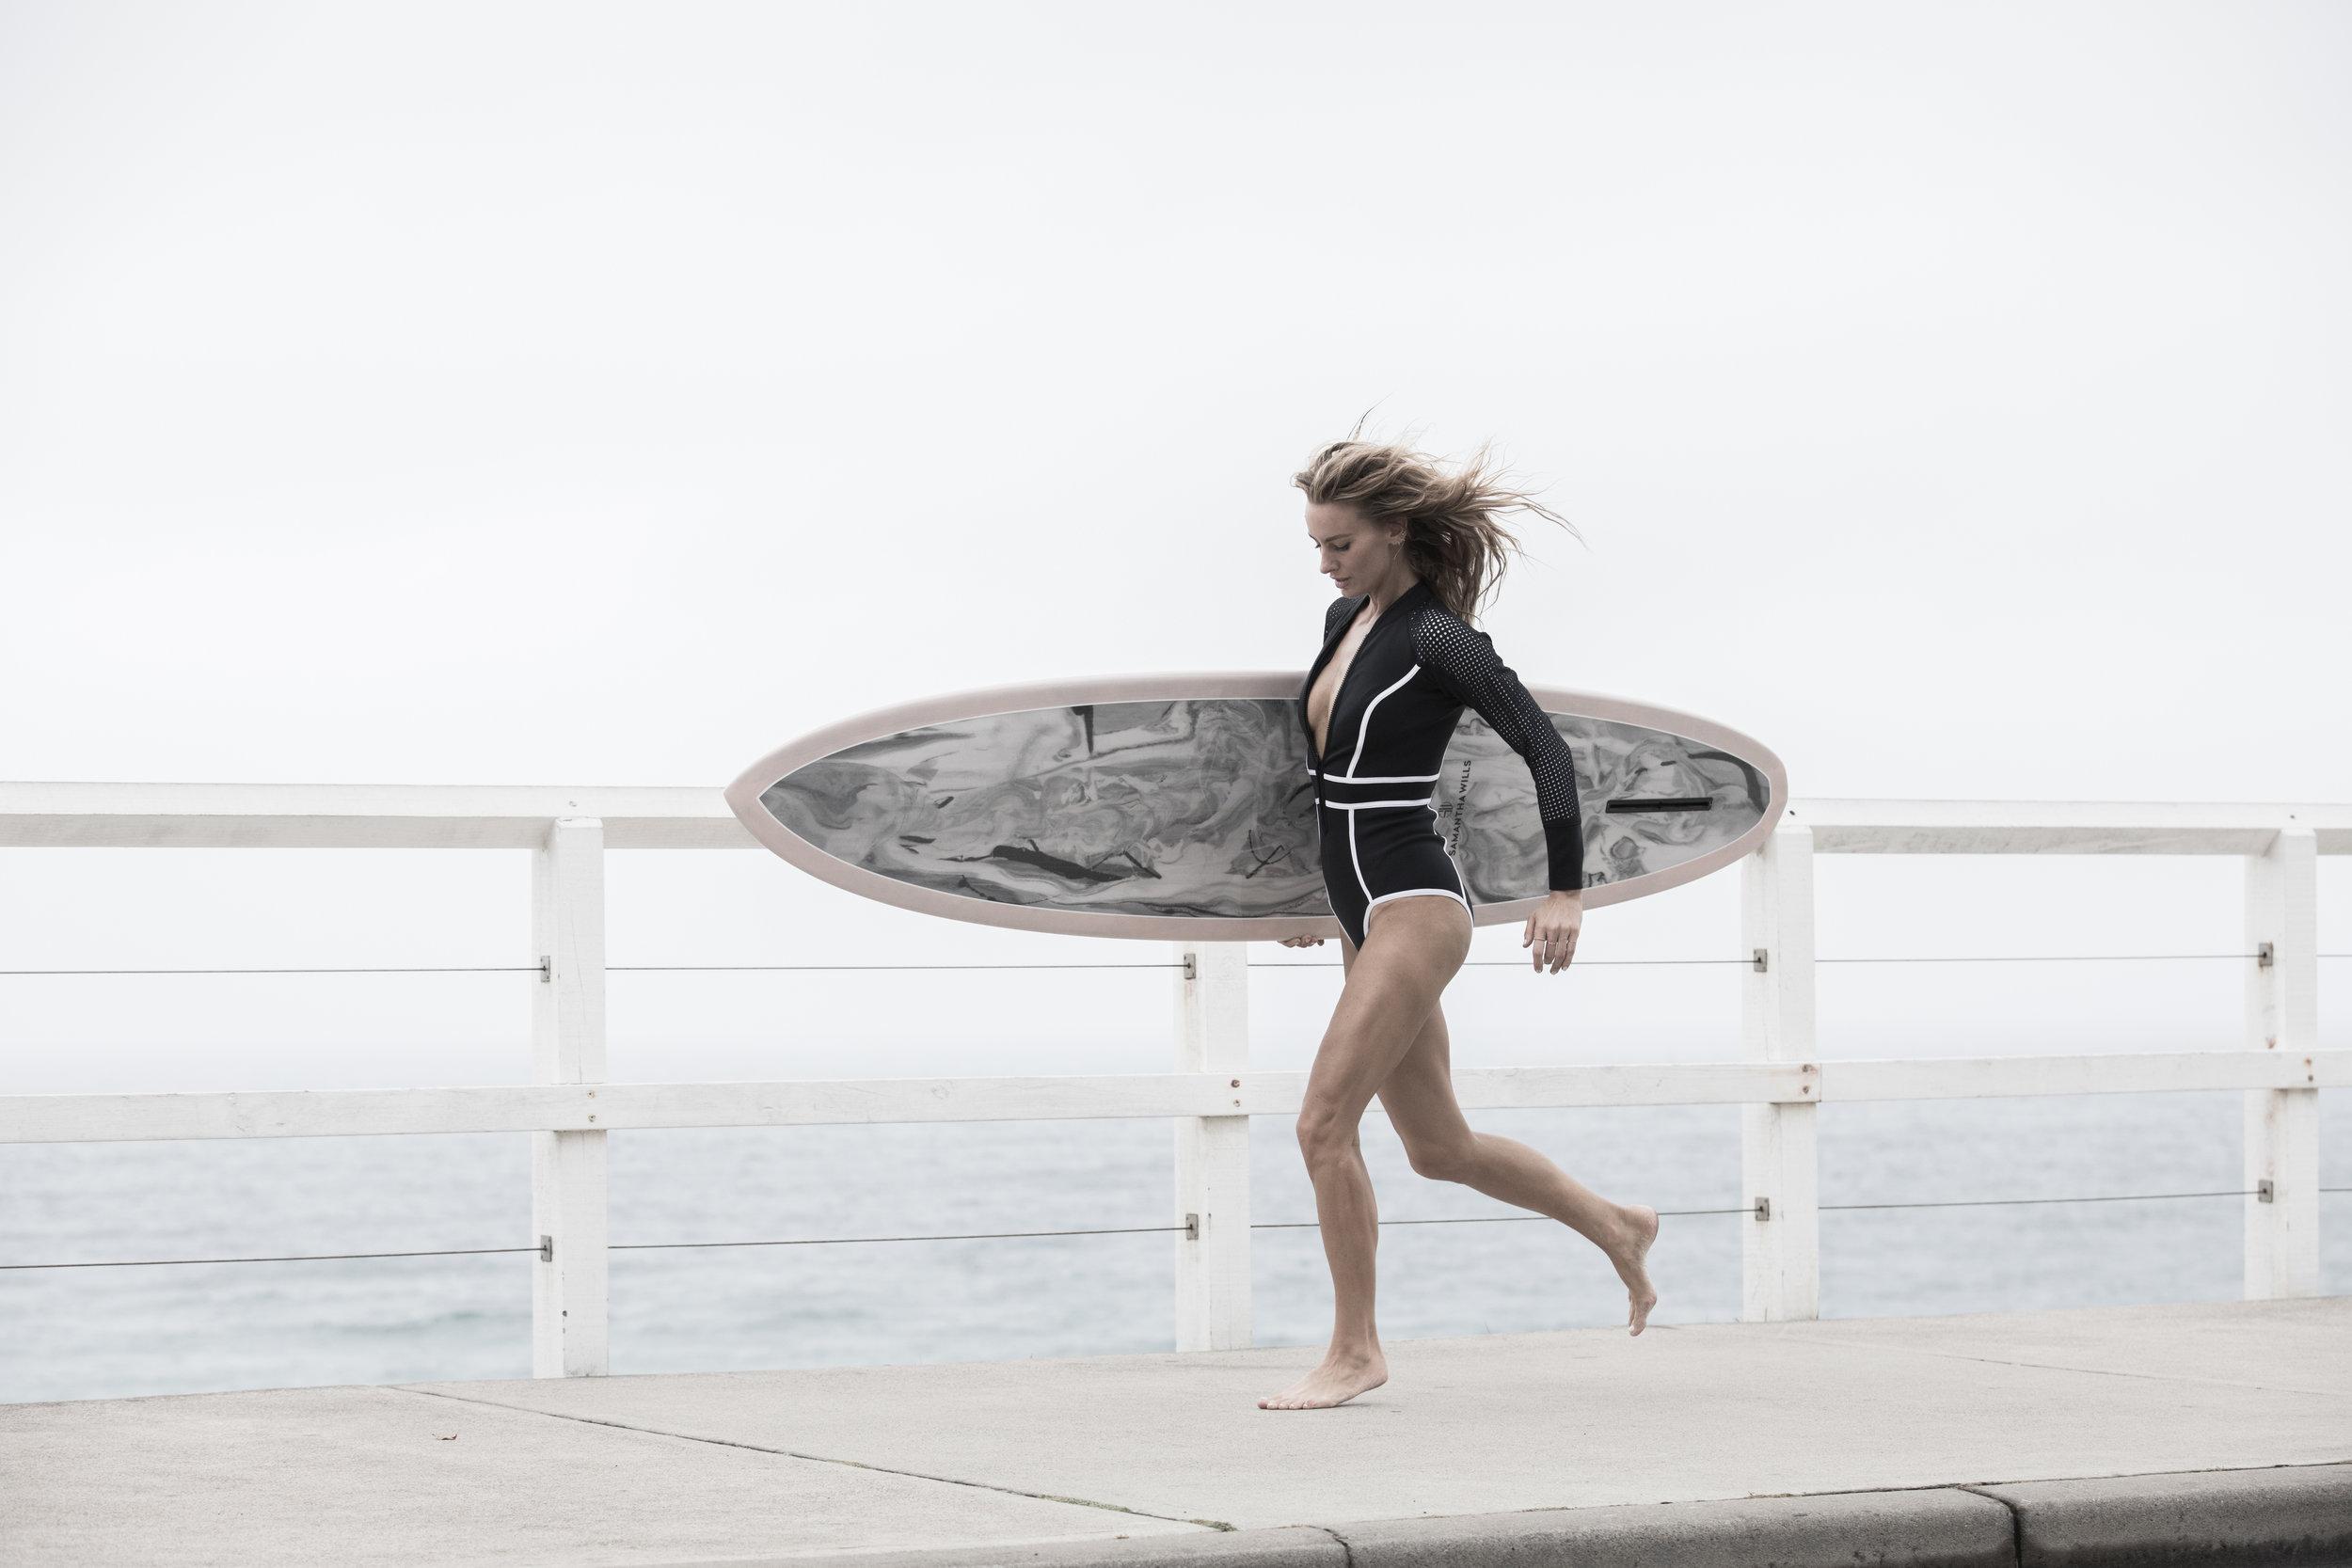 SW_SURFBOARDS_SCOTTEHLER_008.JPG